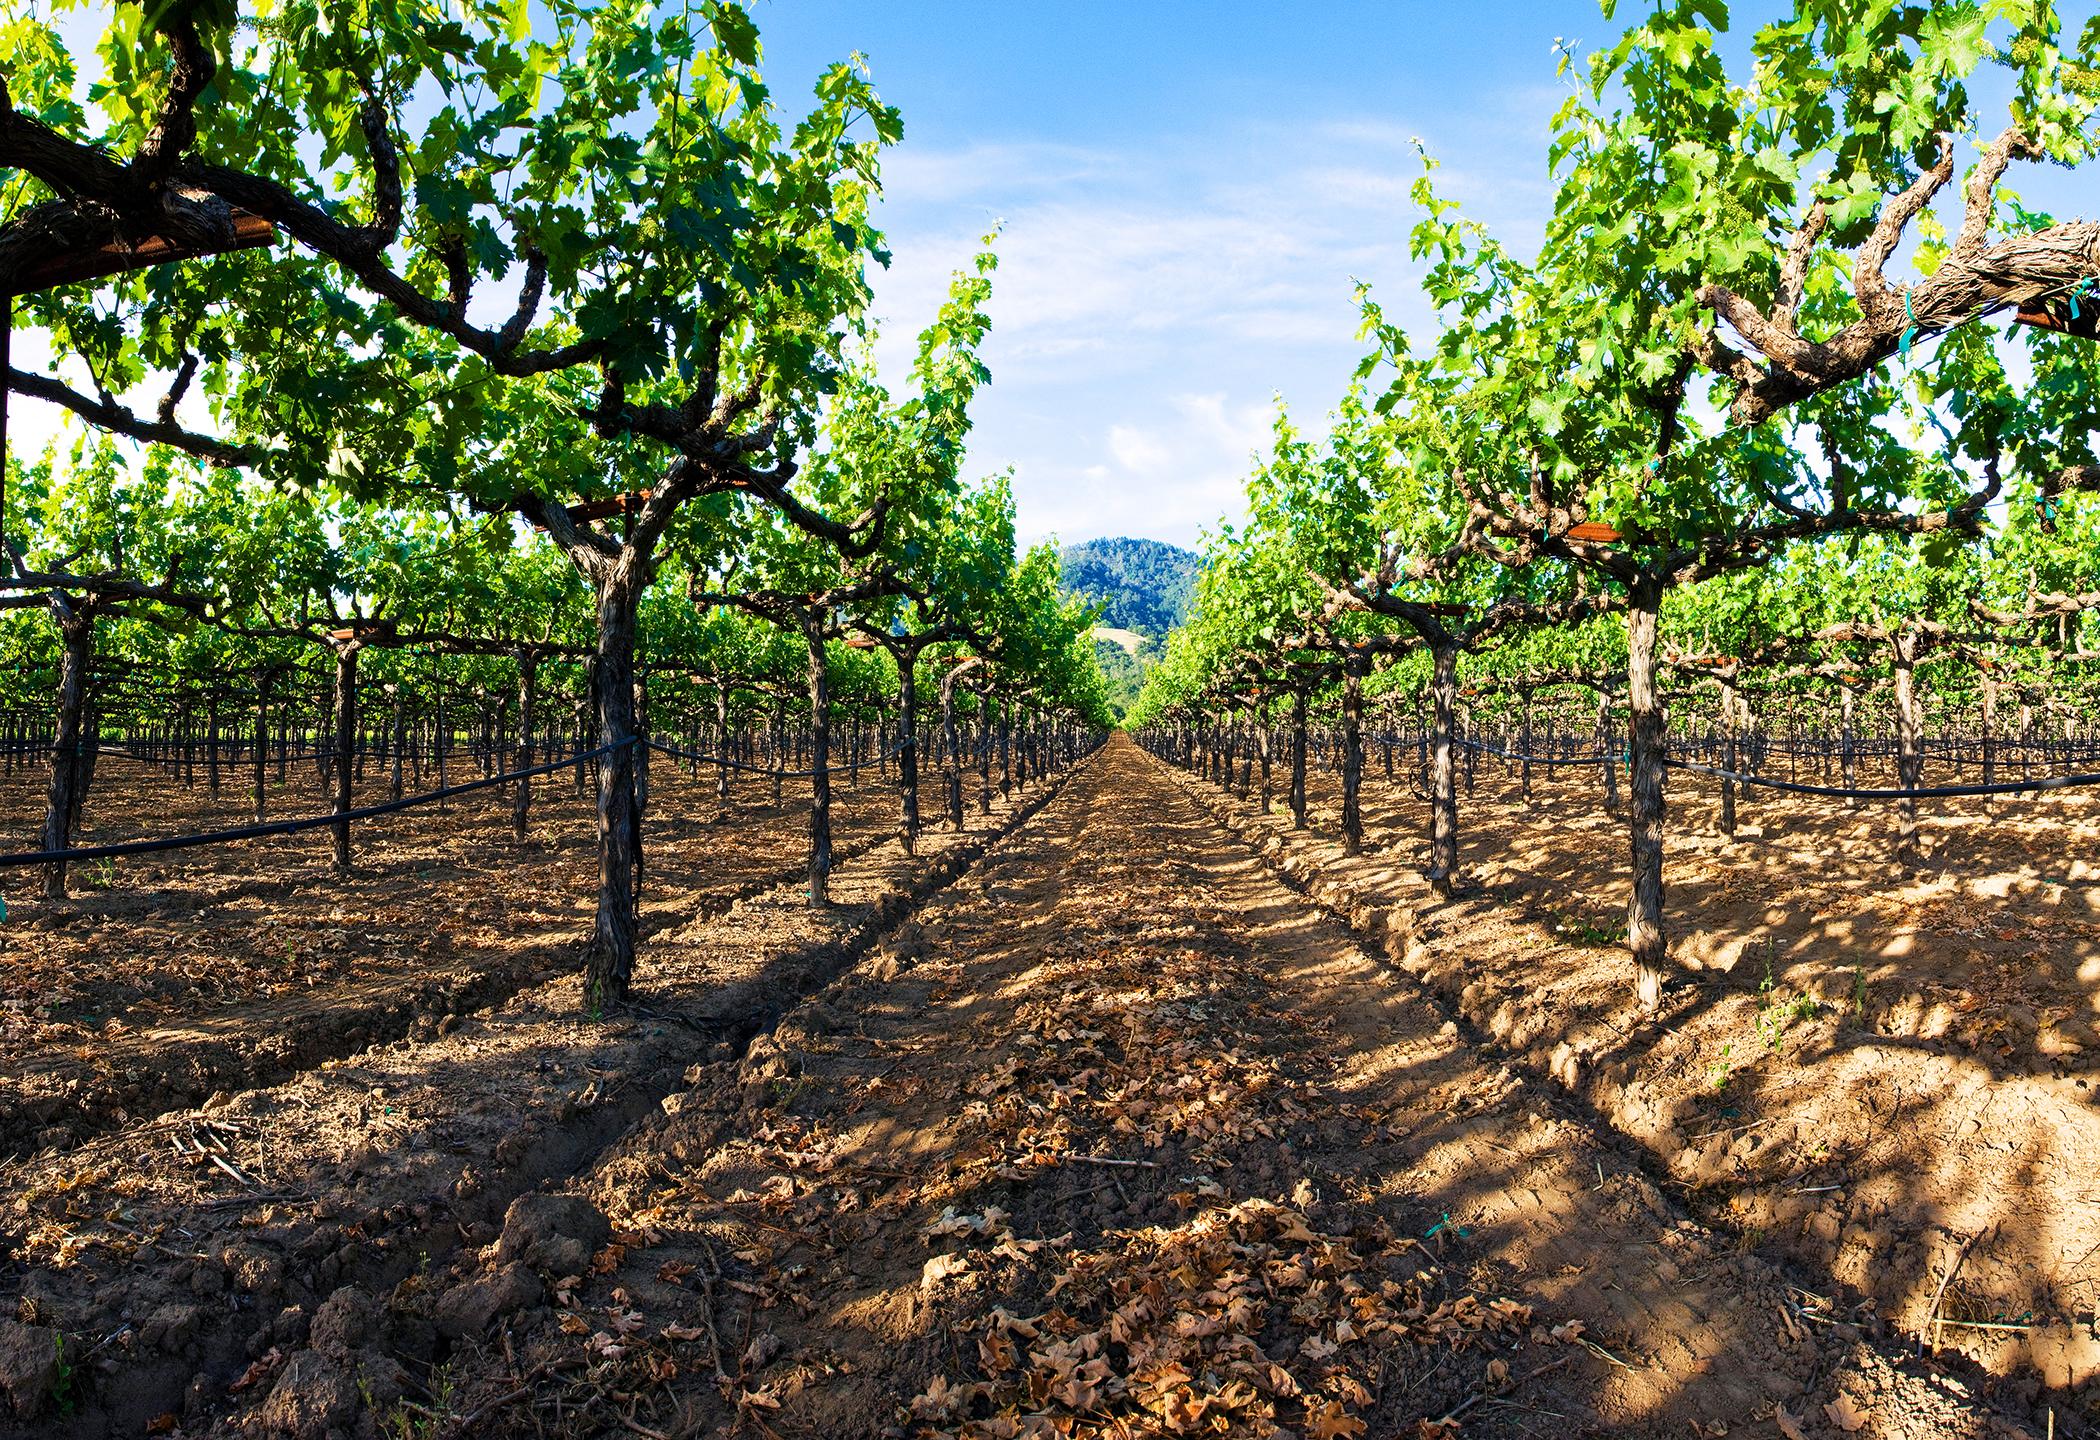 ground level image of vineyard rows